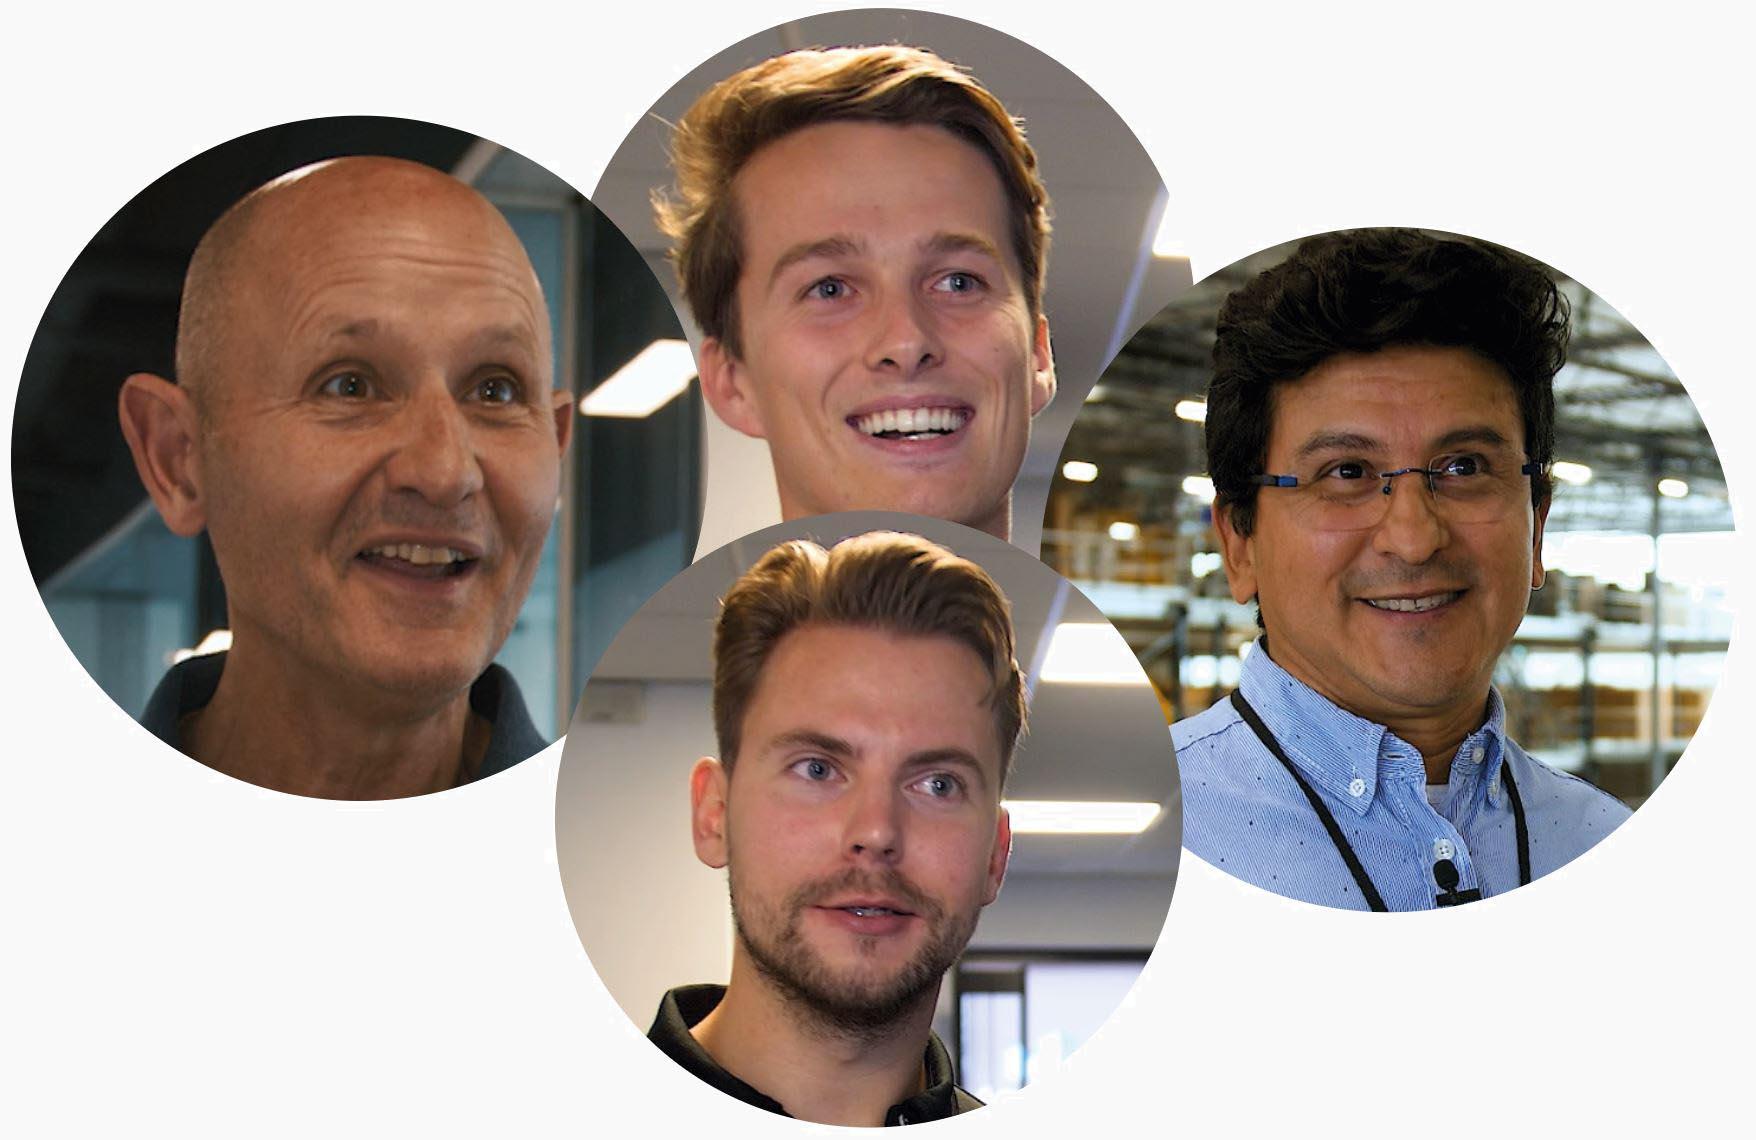 Customer faces